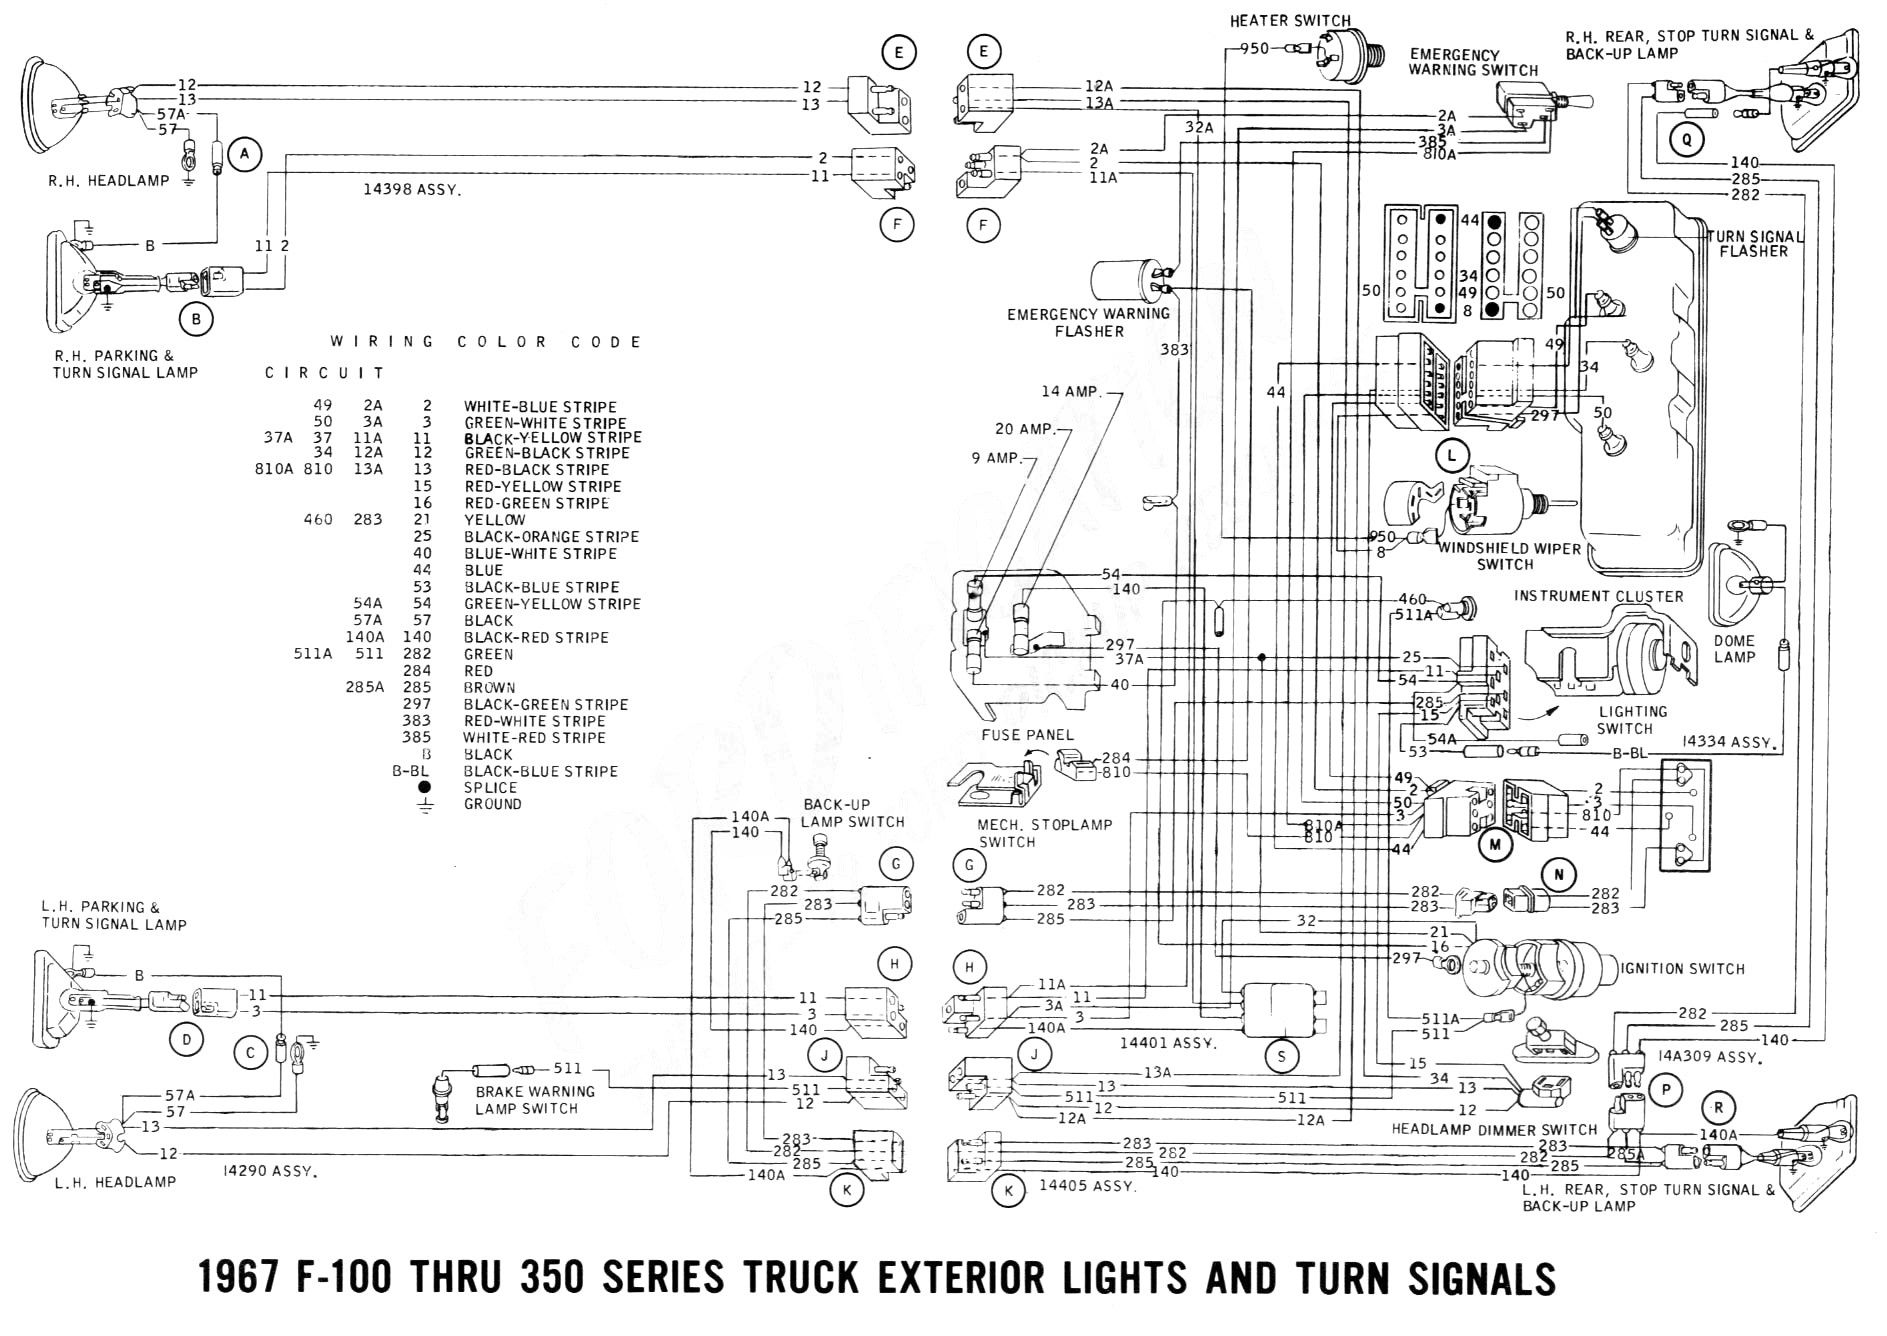 [DIAGRAM] 283 Wiring Diagram